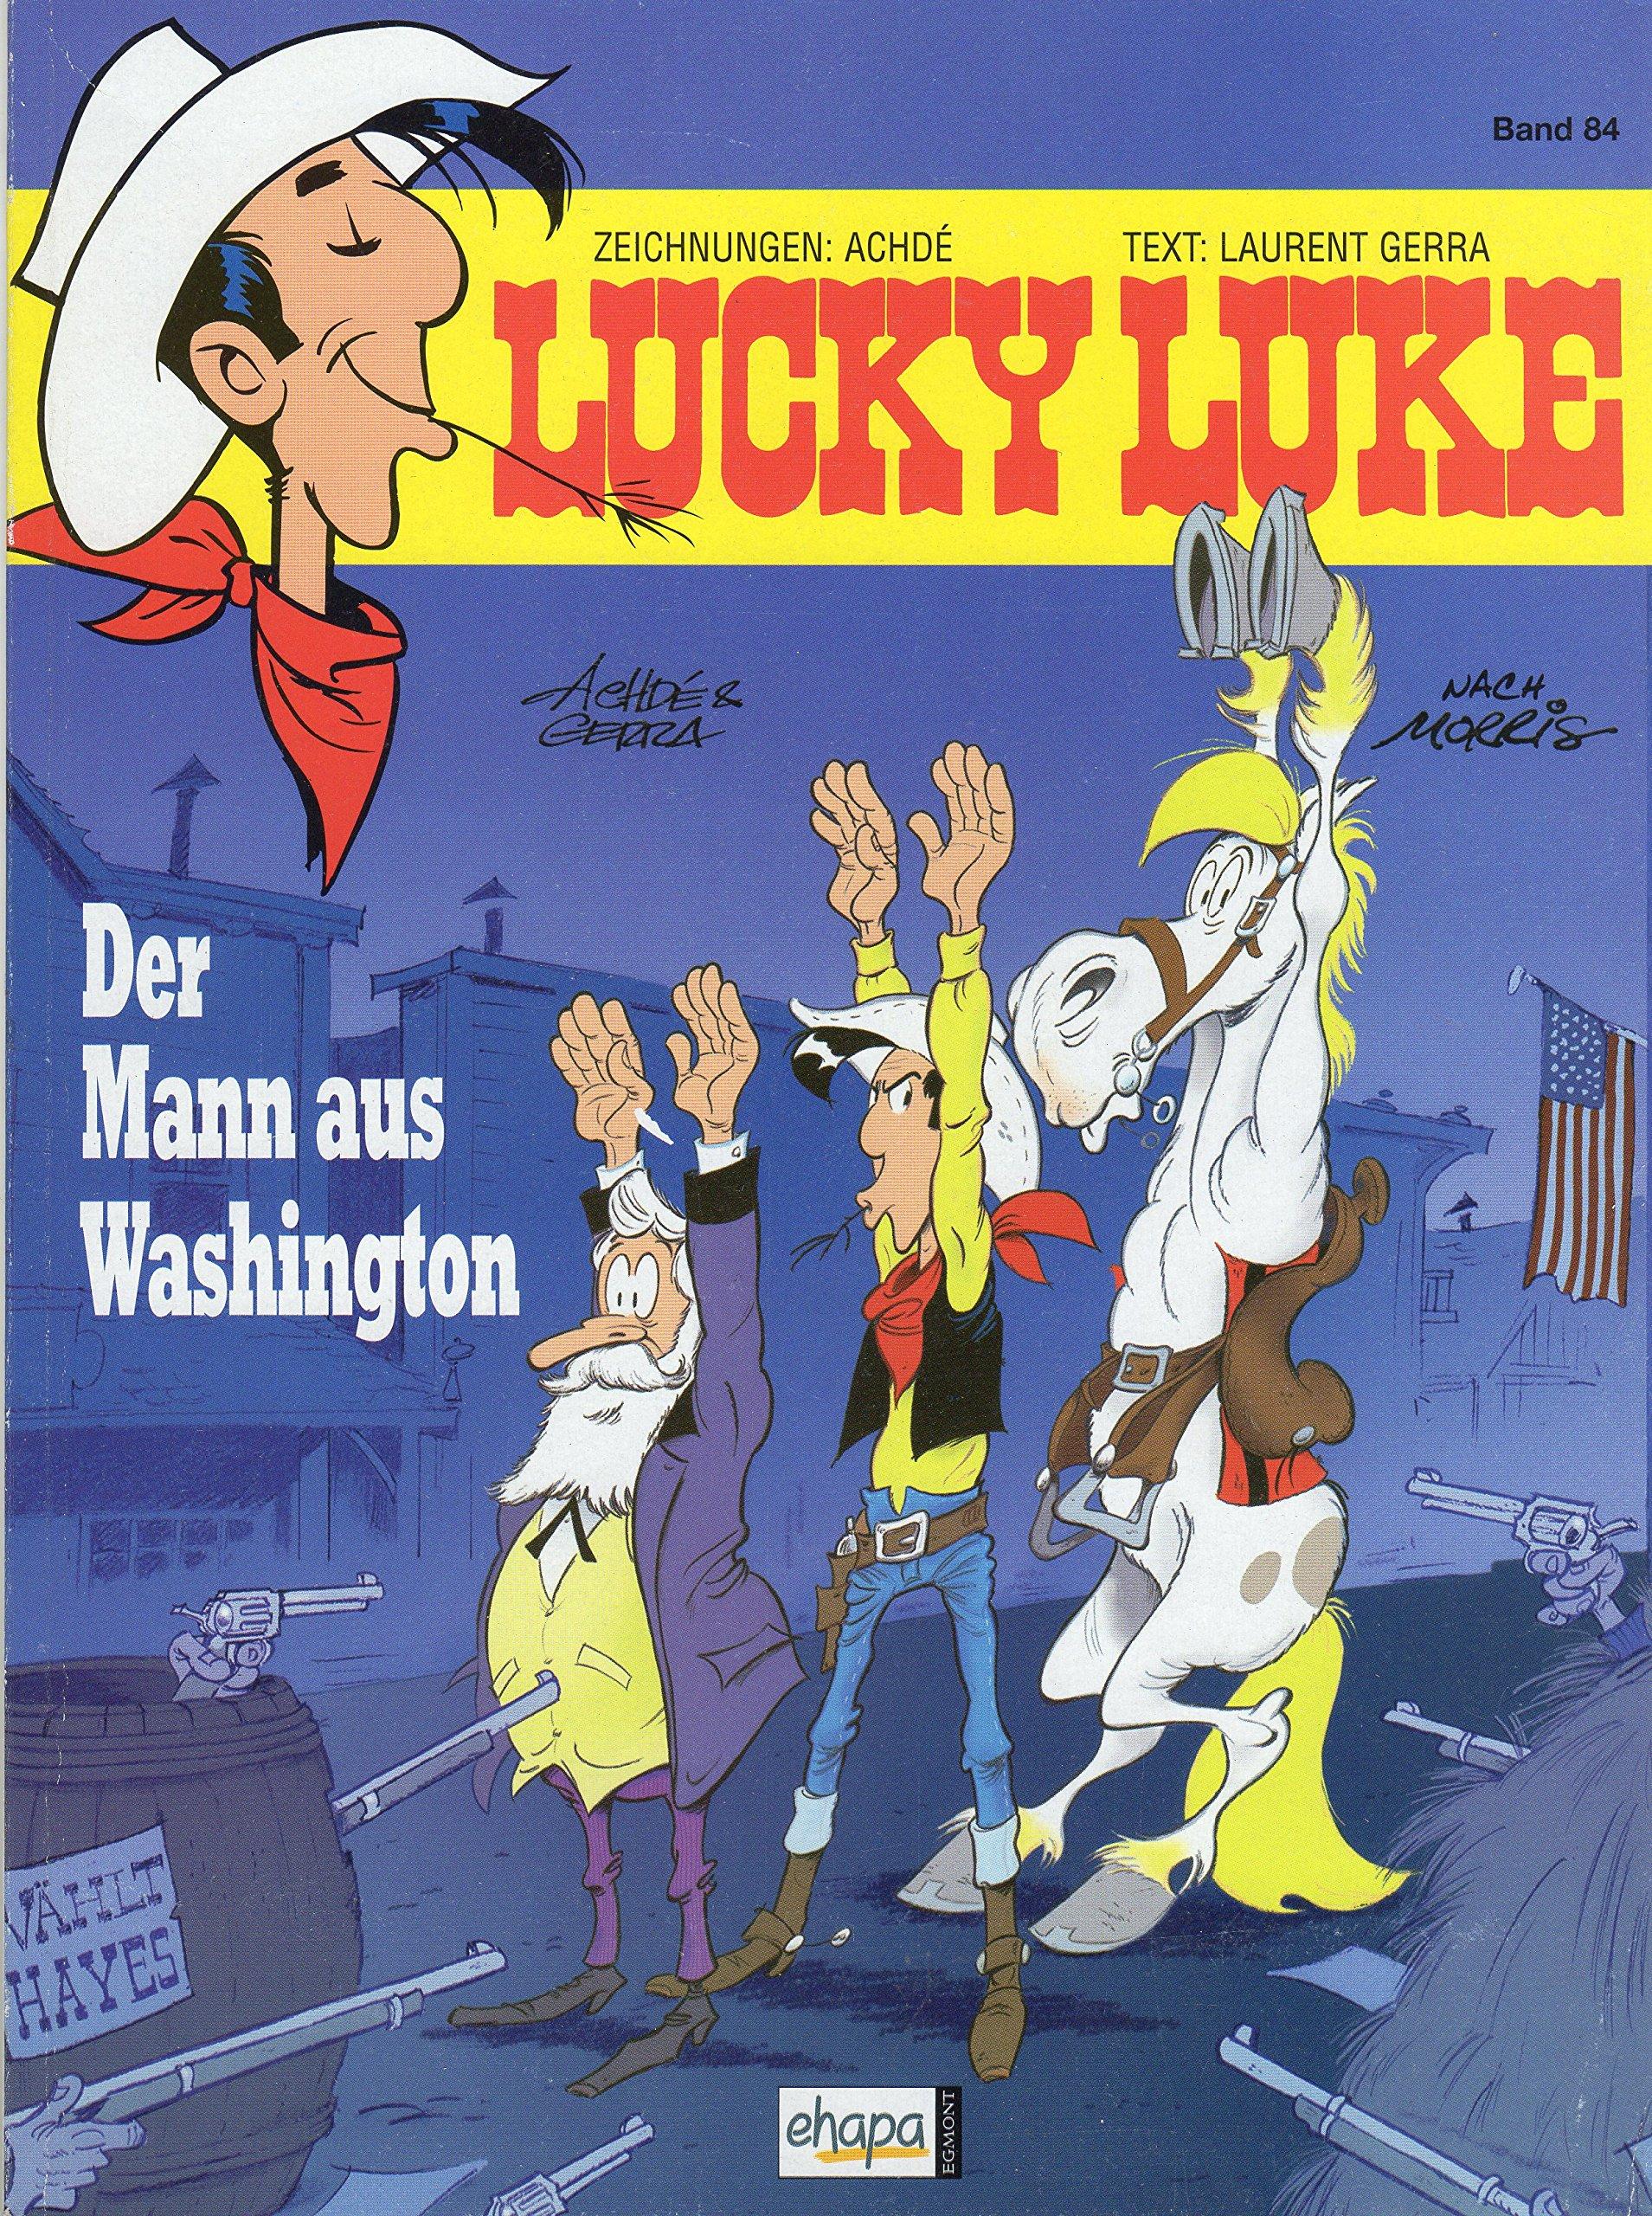 Zeichnungen Achdé Text  Gerra LUCKY LUKE Comic Album  Softcover  Band 84  DER MANN AUS WASHINGTON